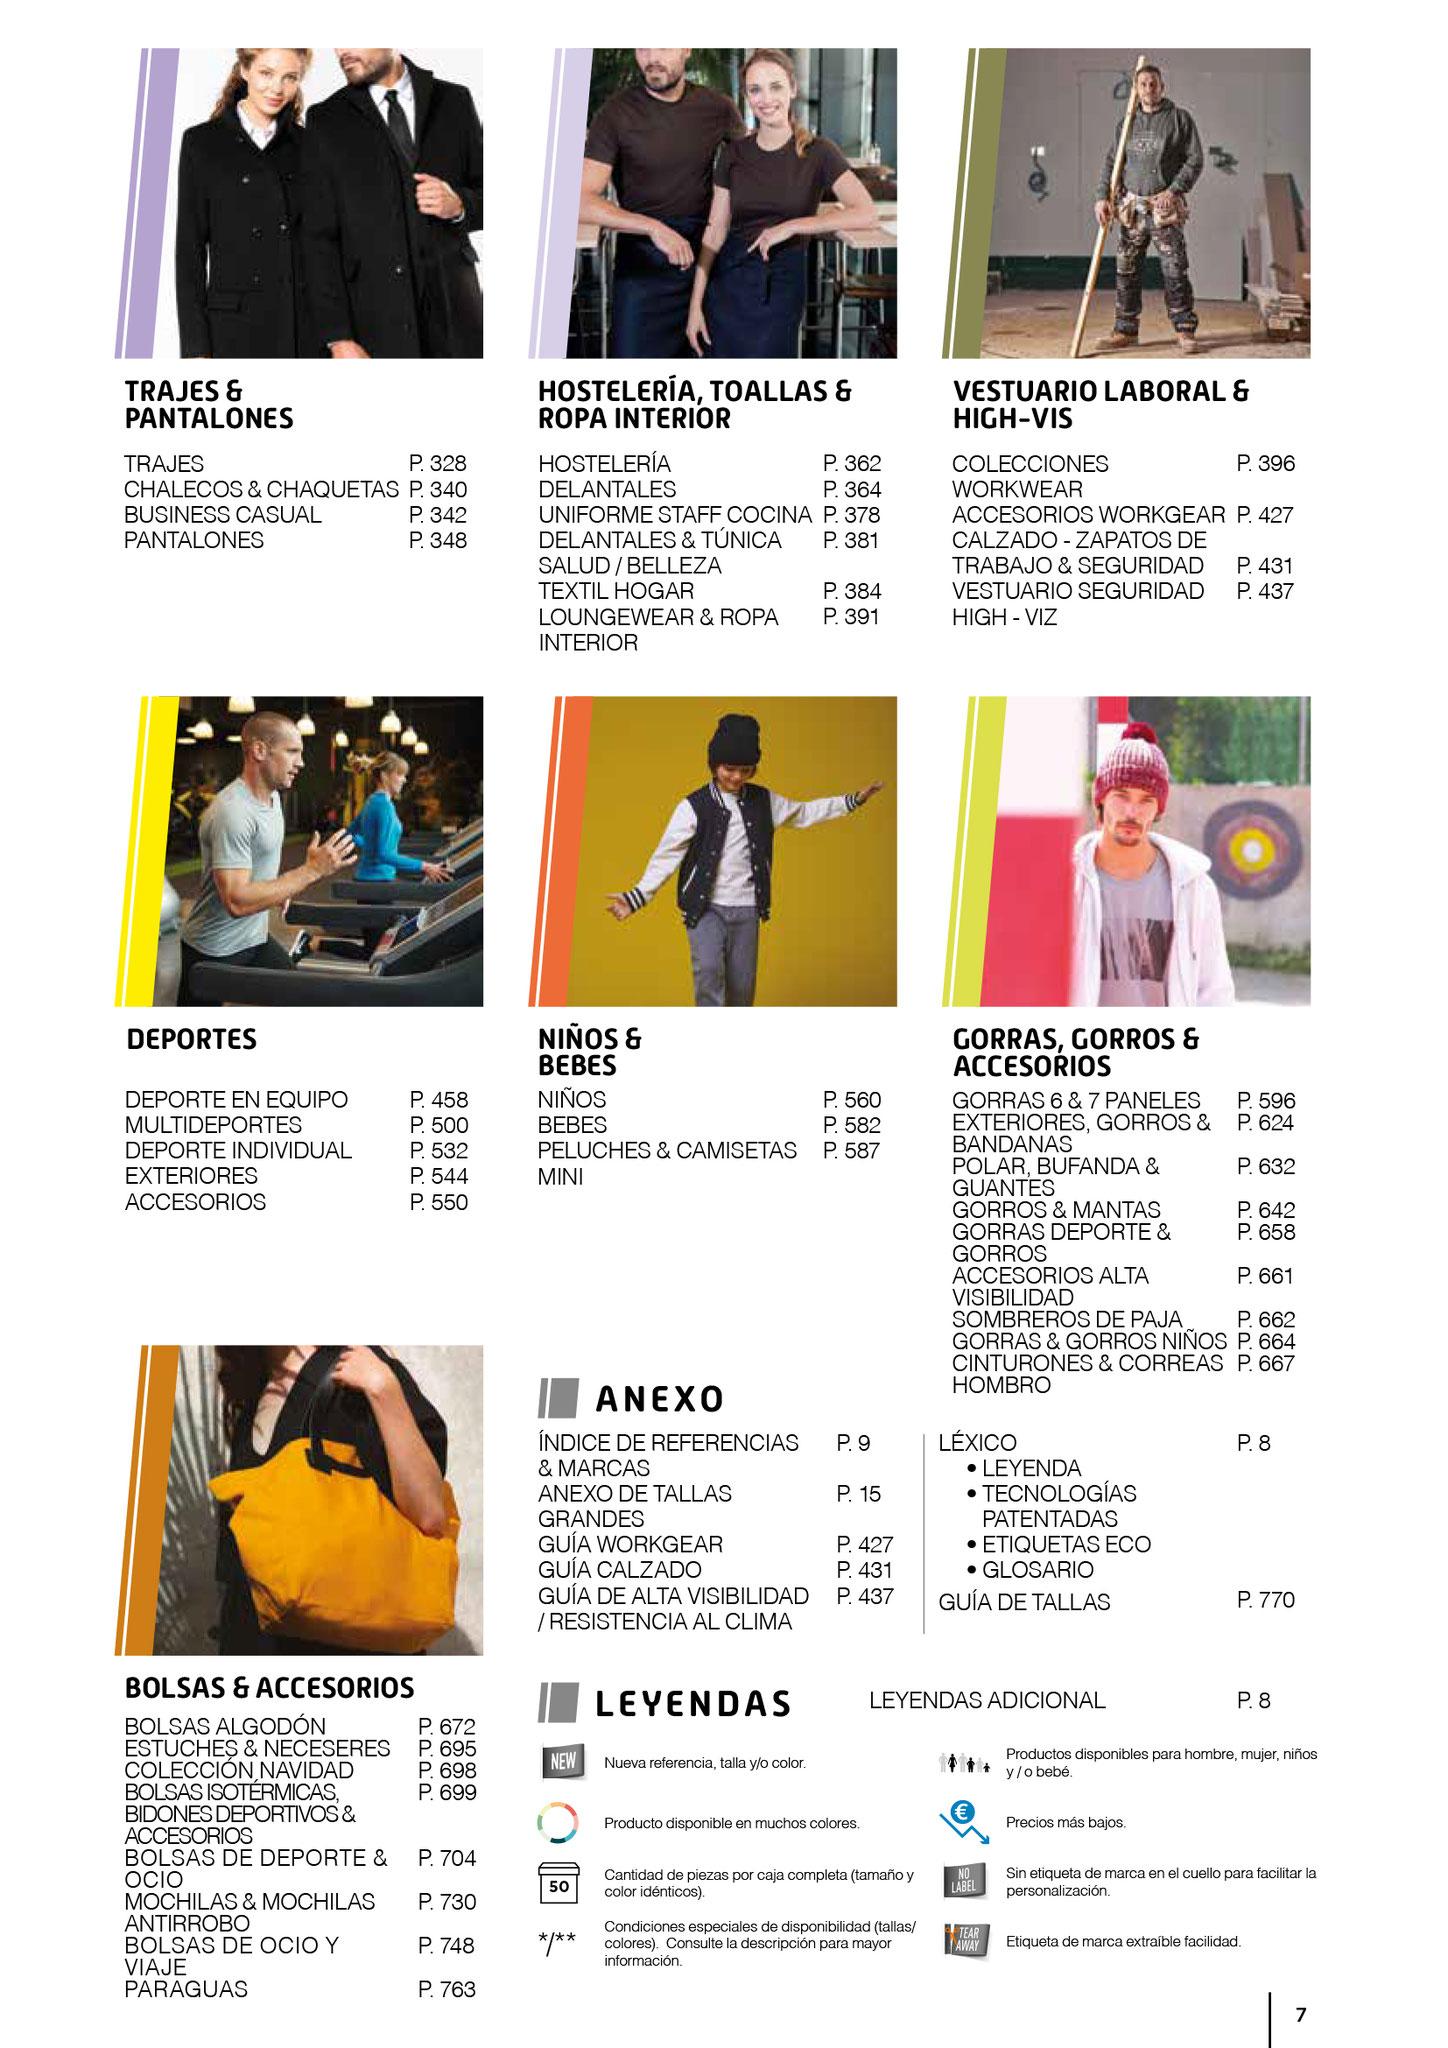 Index textil 2020 , publicidad textil masqueregalos, Marcas Kariban, Proact, Kup, Ki.mod, Fruit of the Loom, Gilda, Result, Premier,Lee, Timberland,